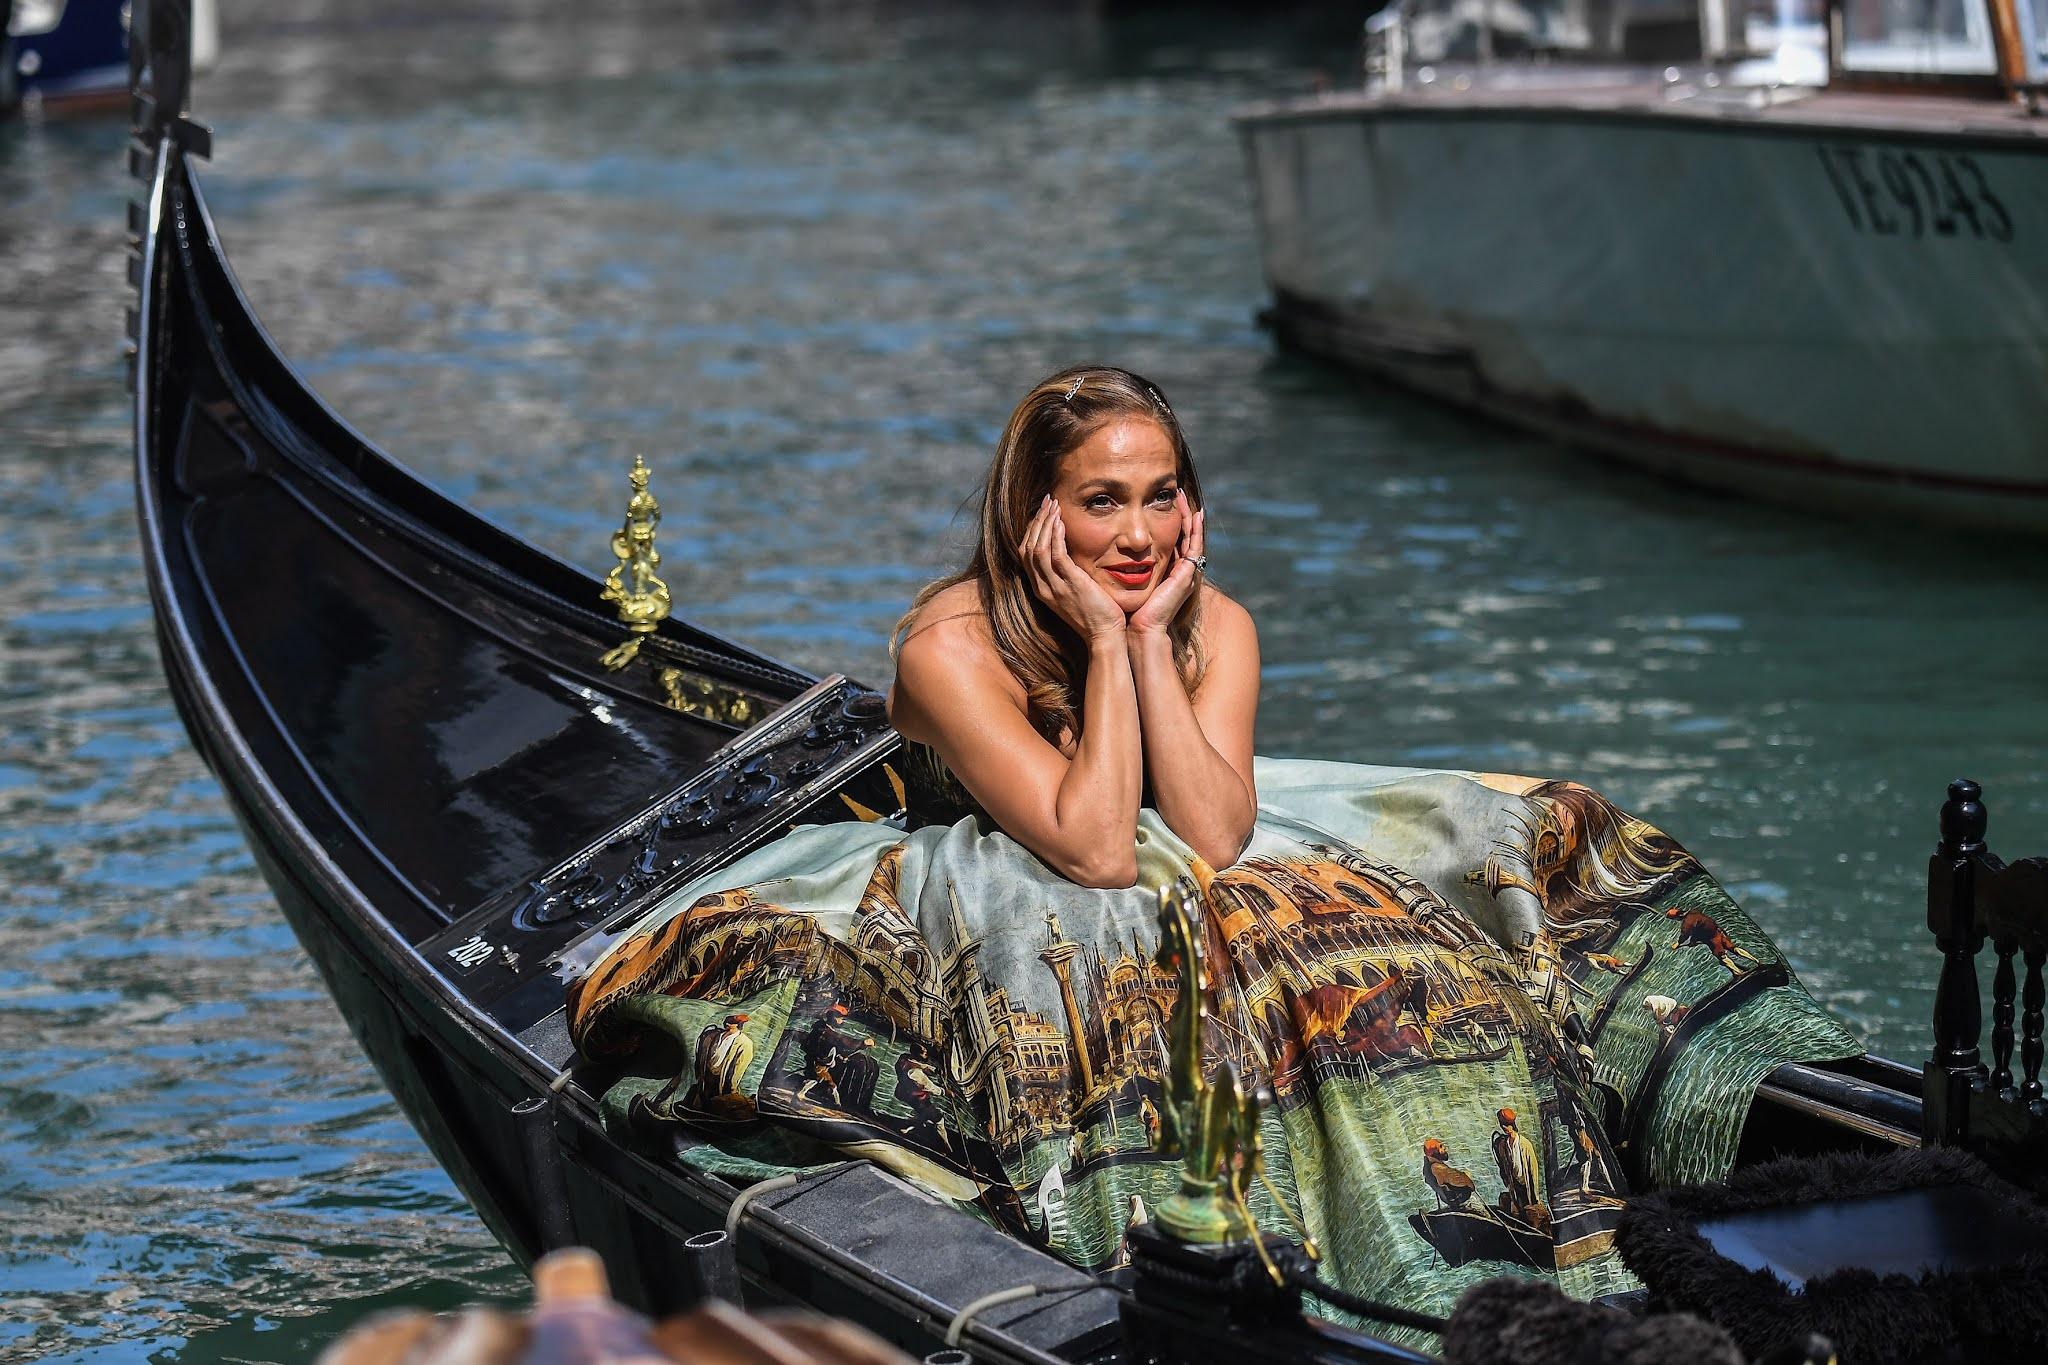 Jennifer Lopez stuns in a waist-cinching Dolce & Gabbana strapless tulle ballgown with a stunning print of Venice